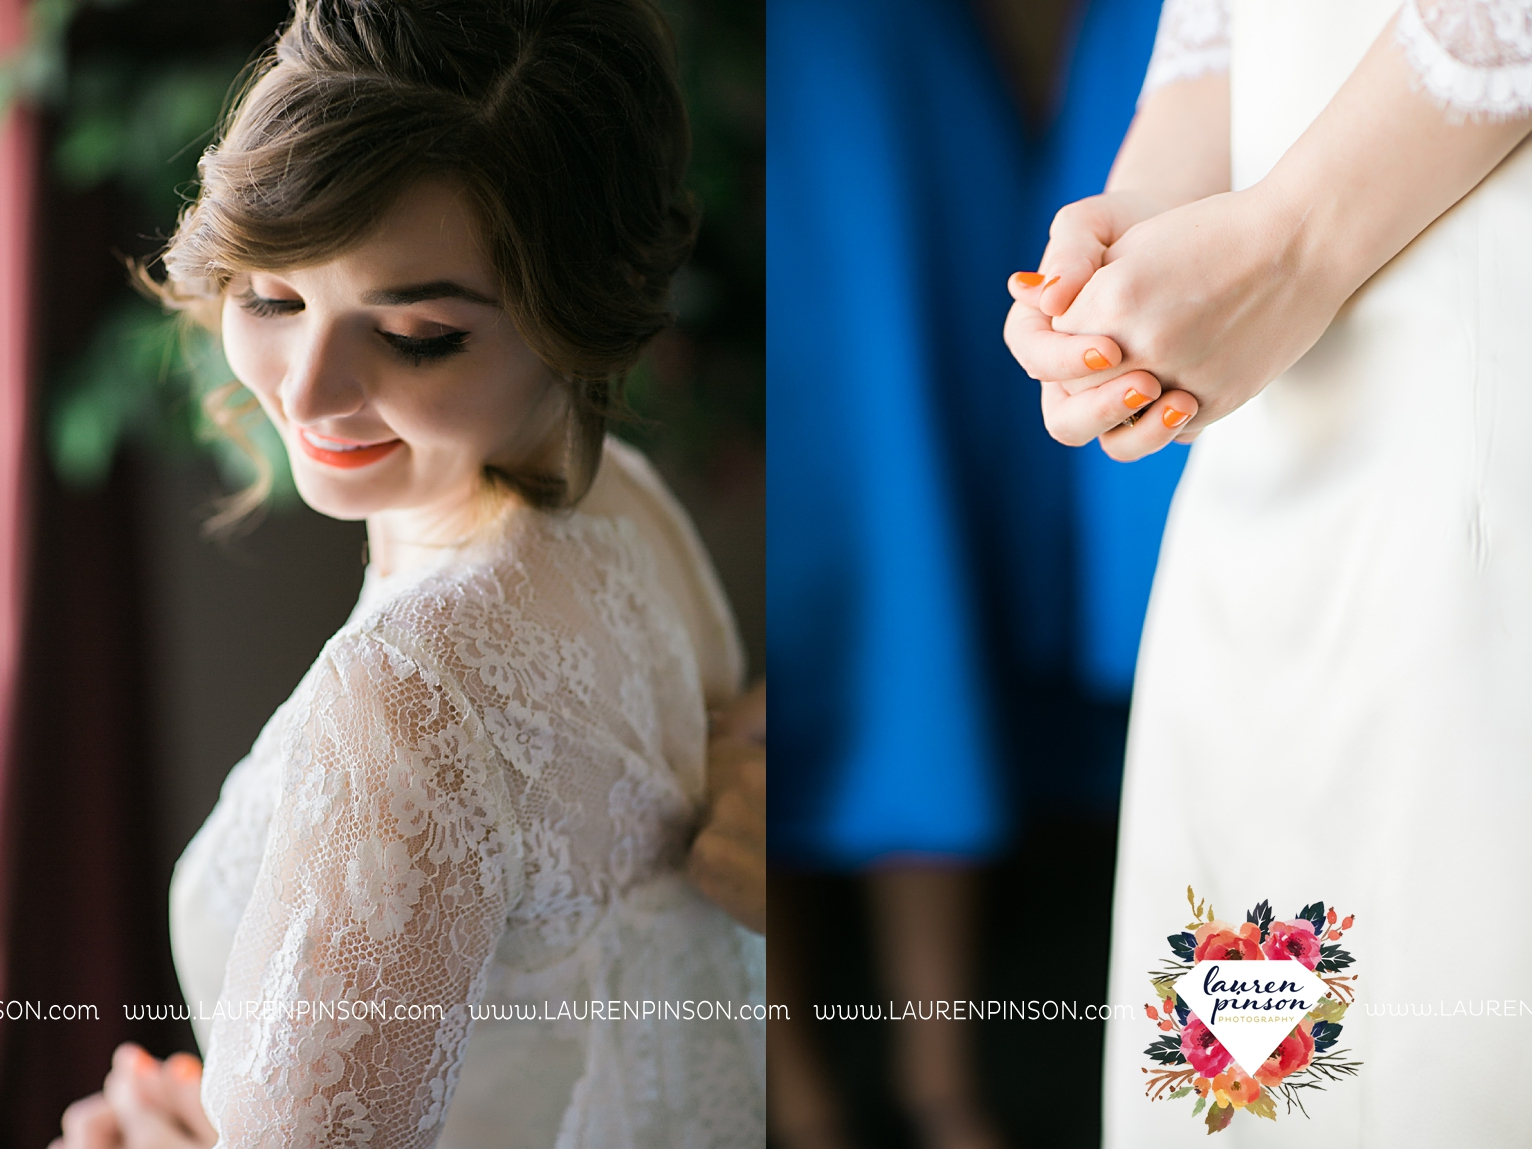 wichita-falls-texas-wedding-photographer-vintage-off-beat-bride-faith-village-church-of-christ-the-plex-roller-skating_2403.jpg